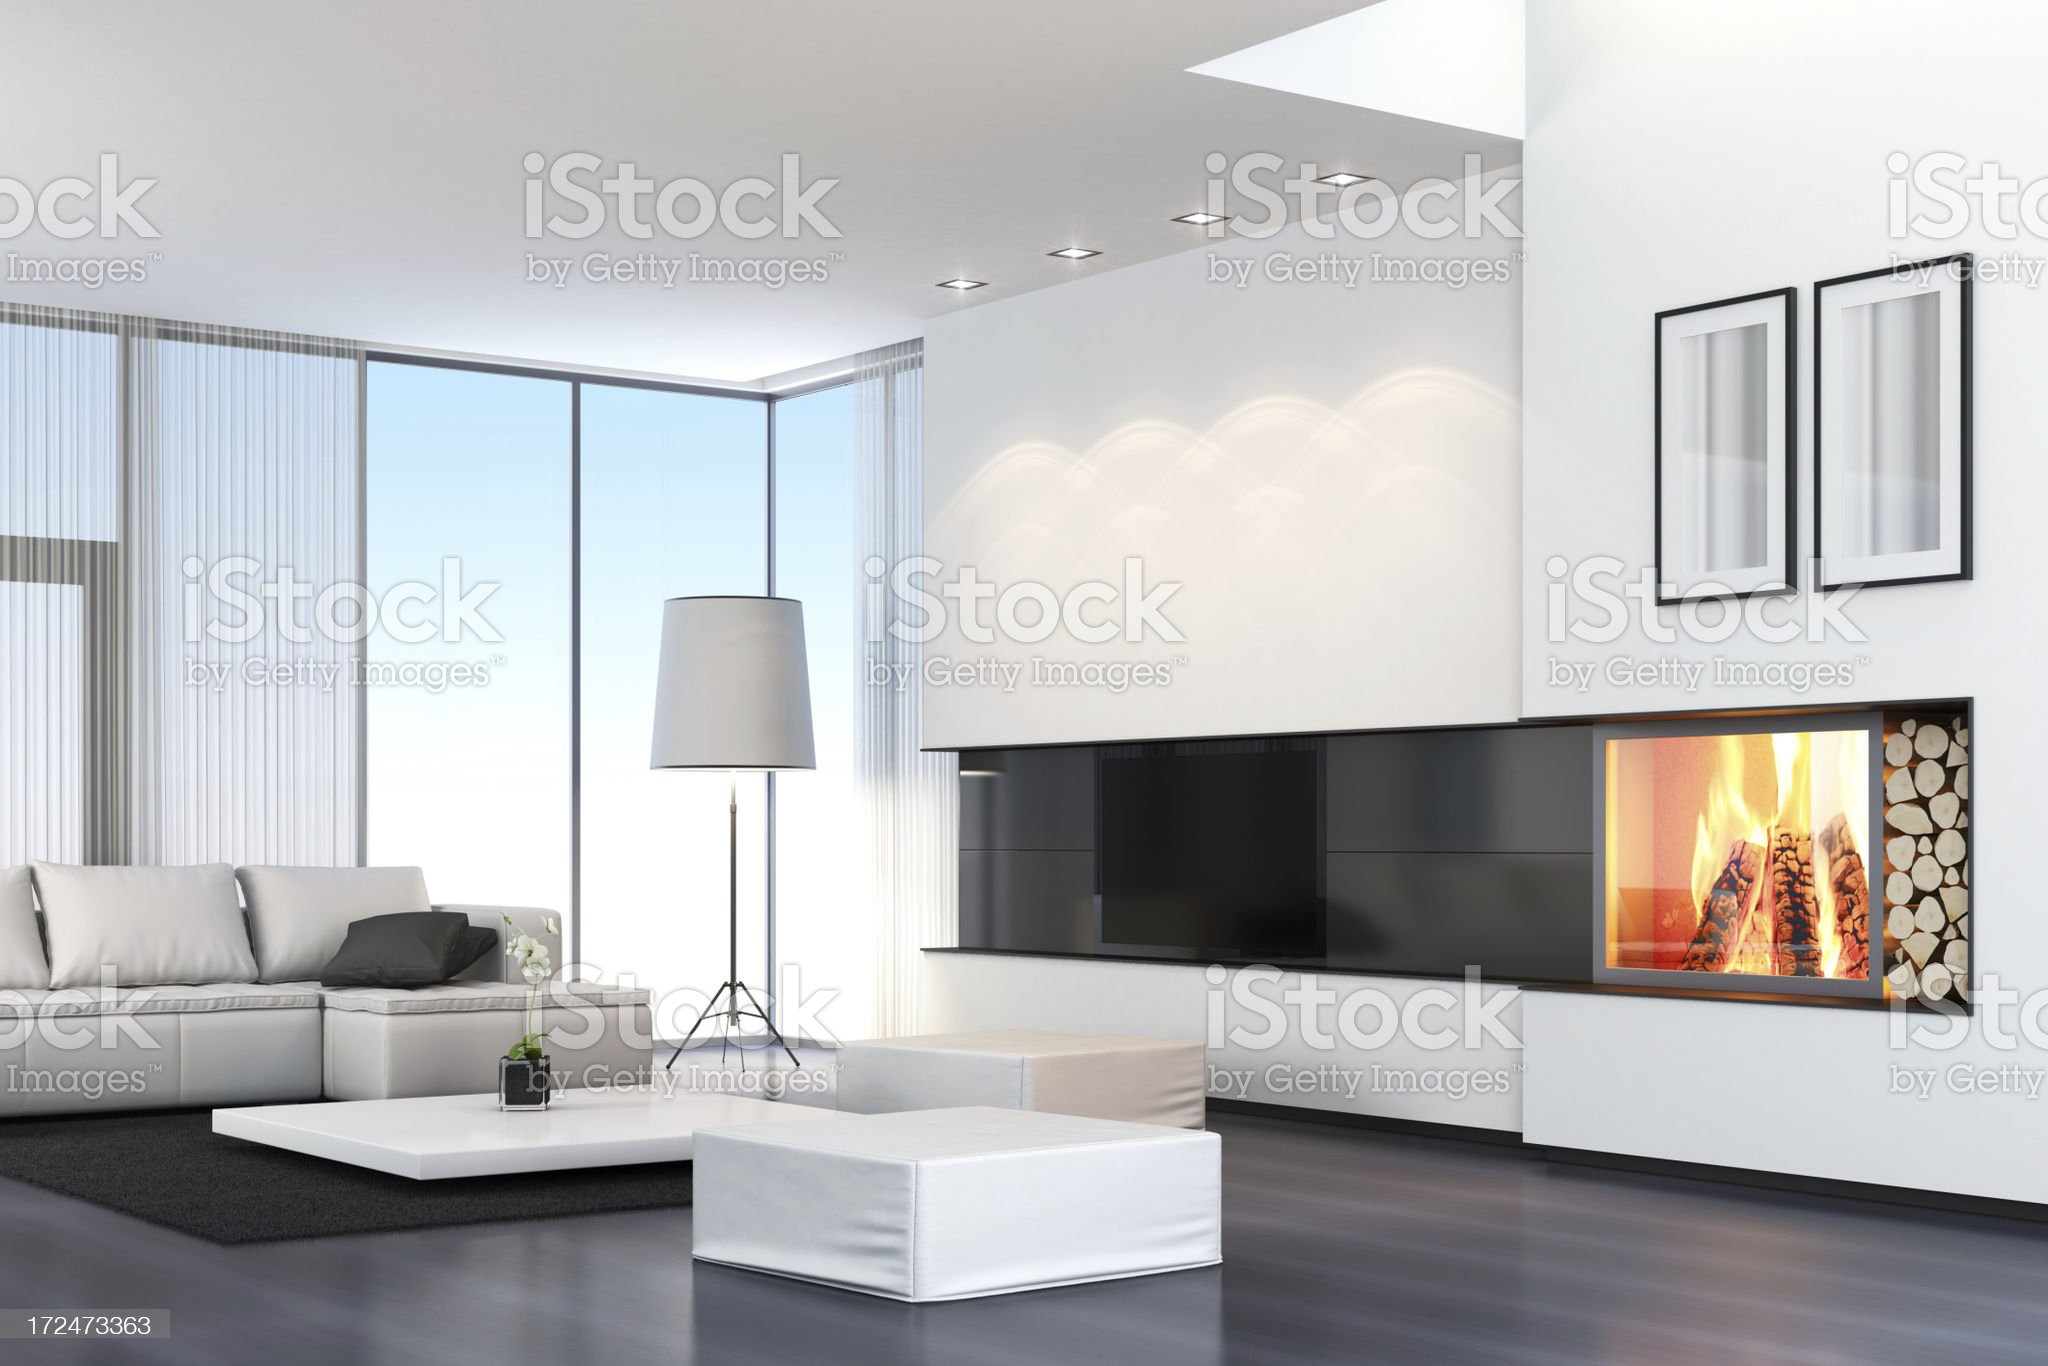 Modern Villa with TV & Fireplace royalty-free stock photo